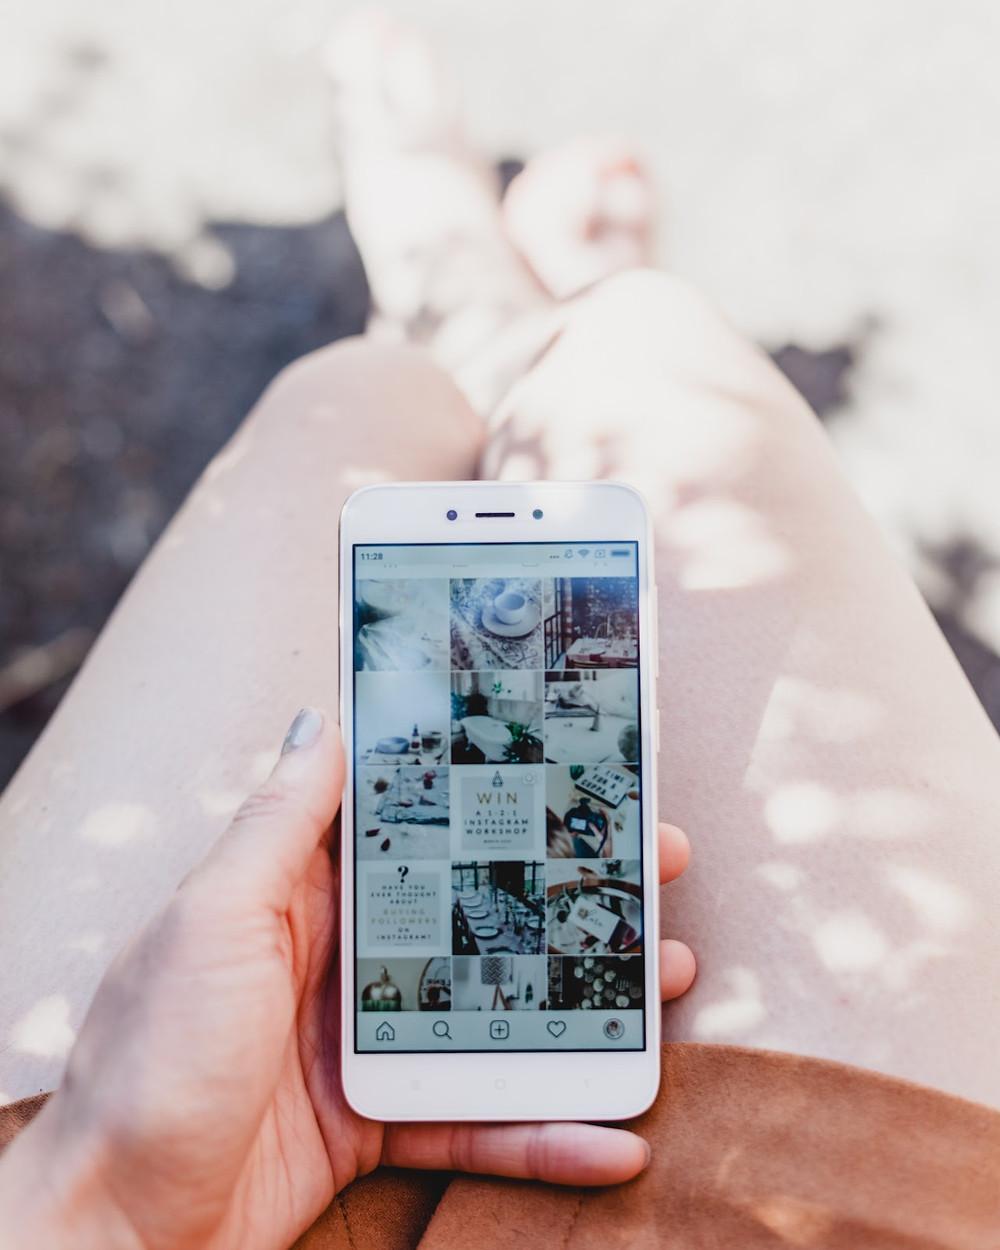 instagram in cellphone hand